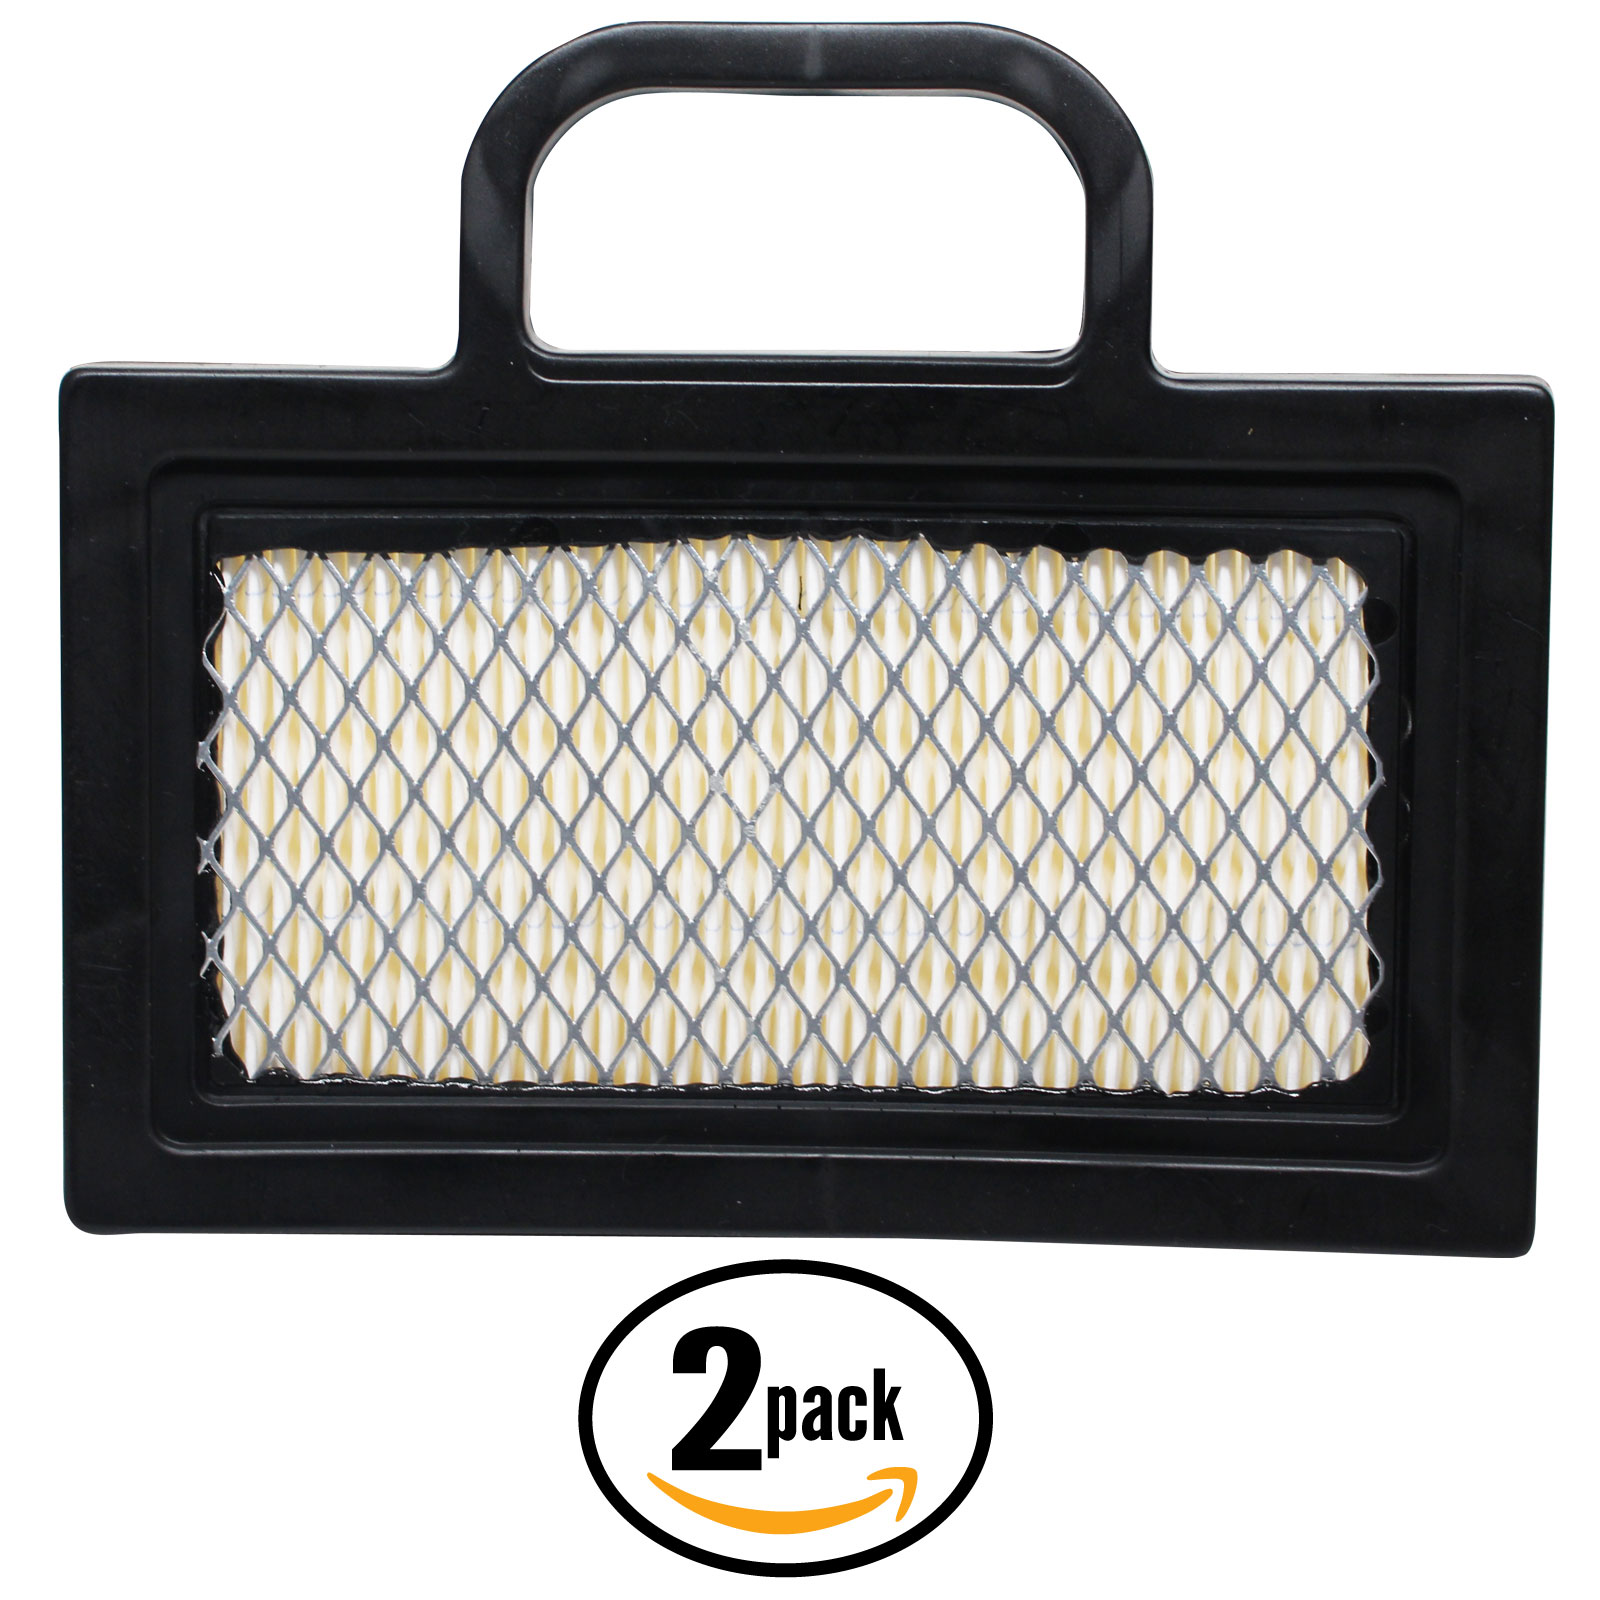 Briggs /& Stratton 9E900 Lawnmower Air Filter Foam Element for Stens 100 632